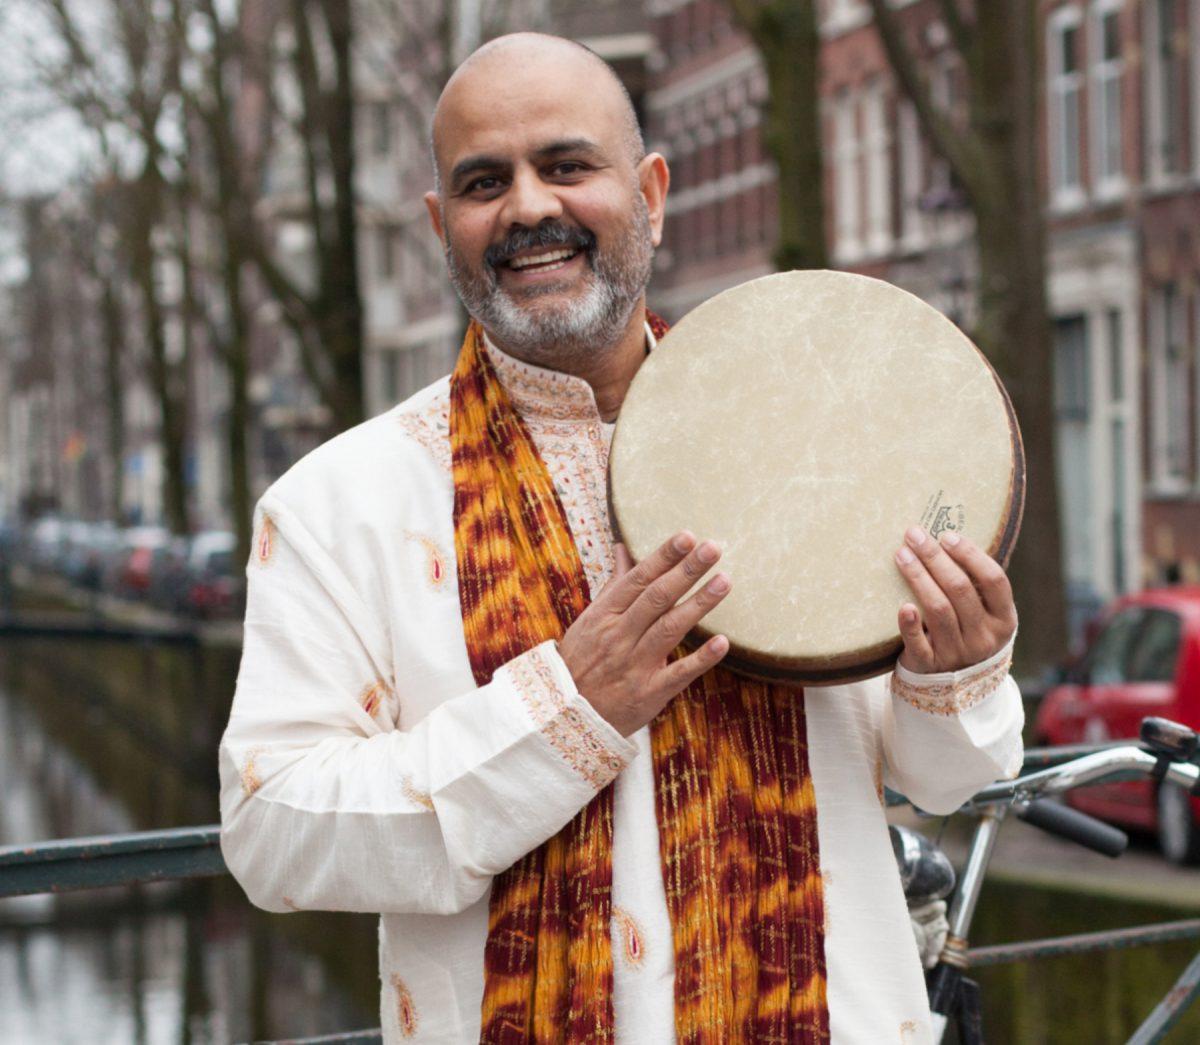 https://festiwalopowiadania.pl/wp-content/uploads/2020/09/Peter-Chand-Amsterdam-Credit-Elise-Gherlan-1200x1045.jpg